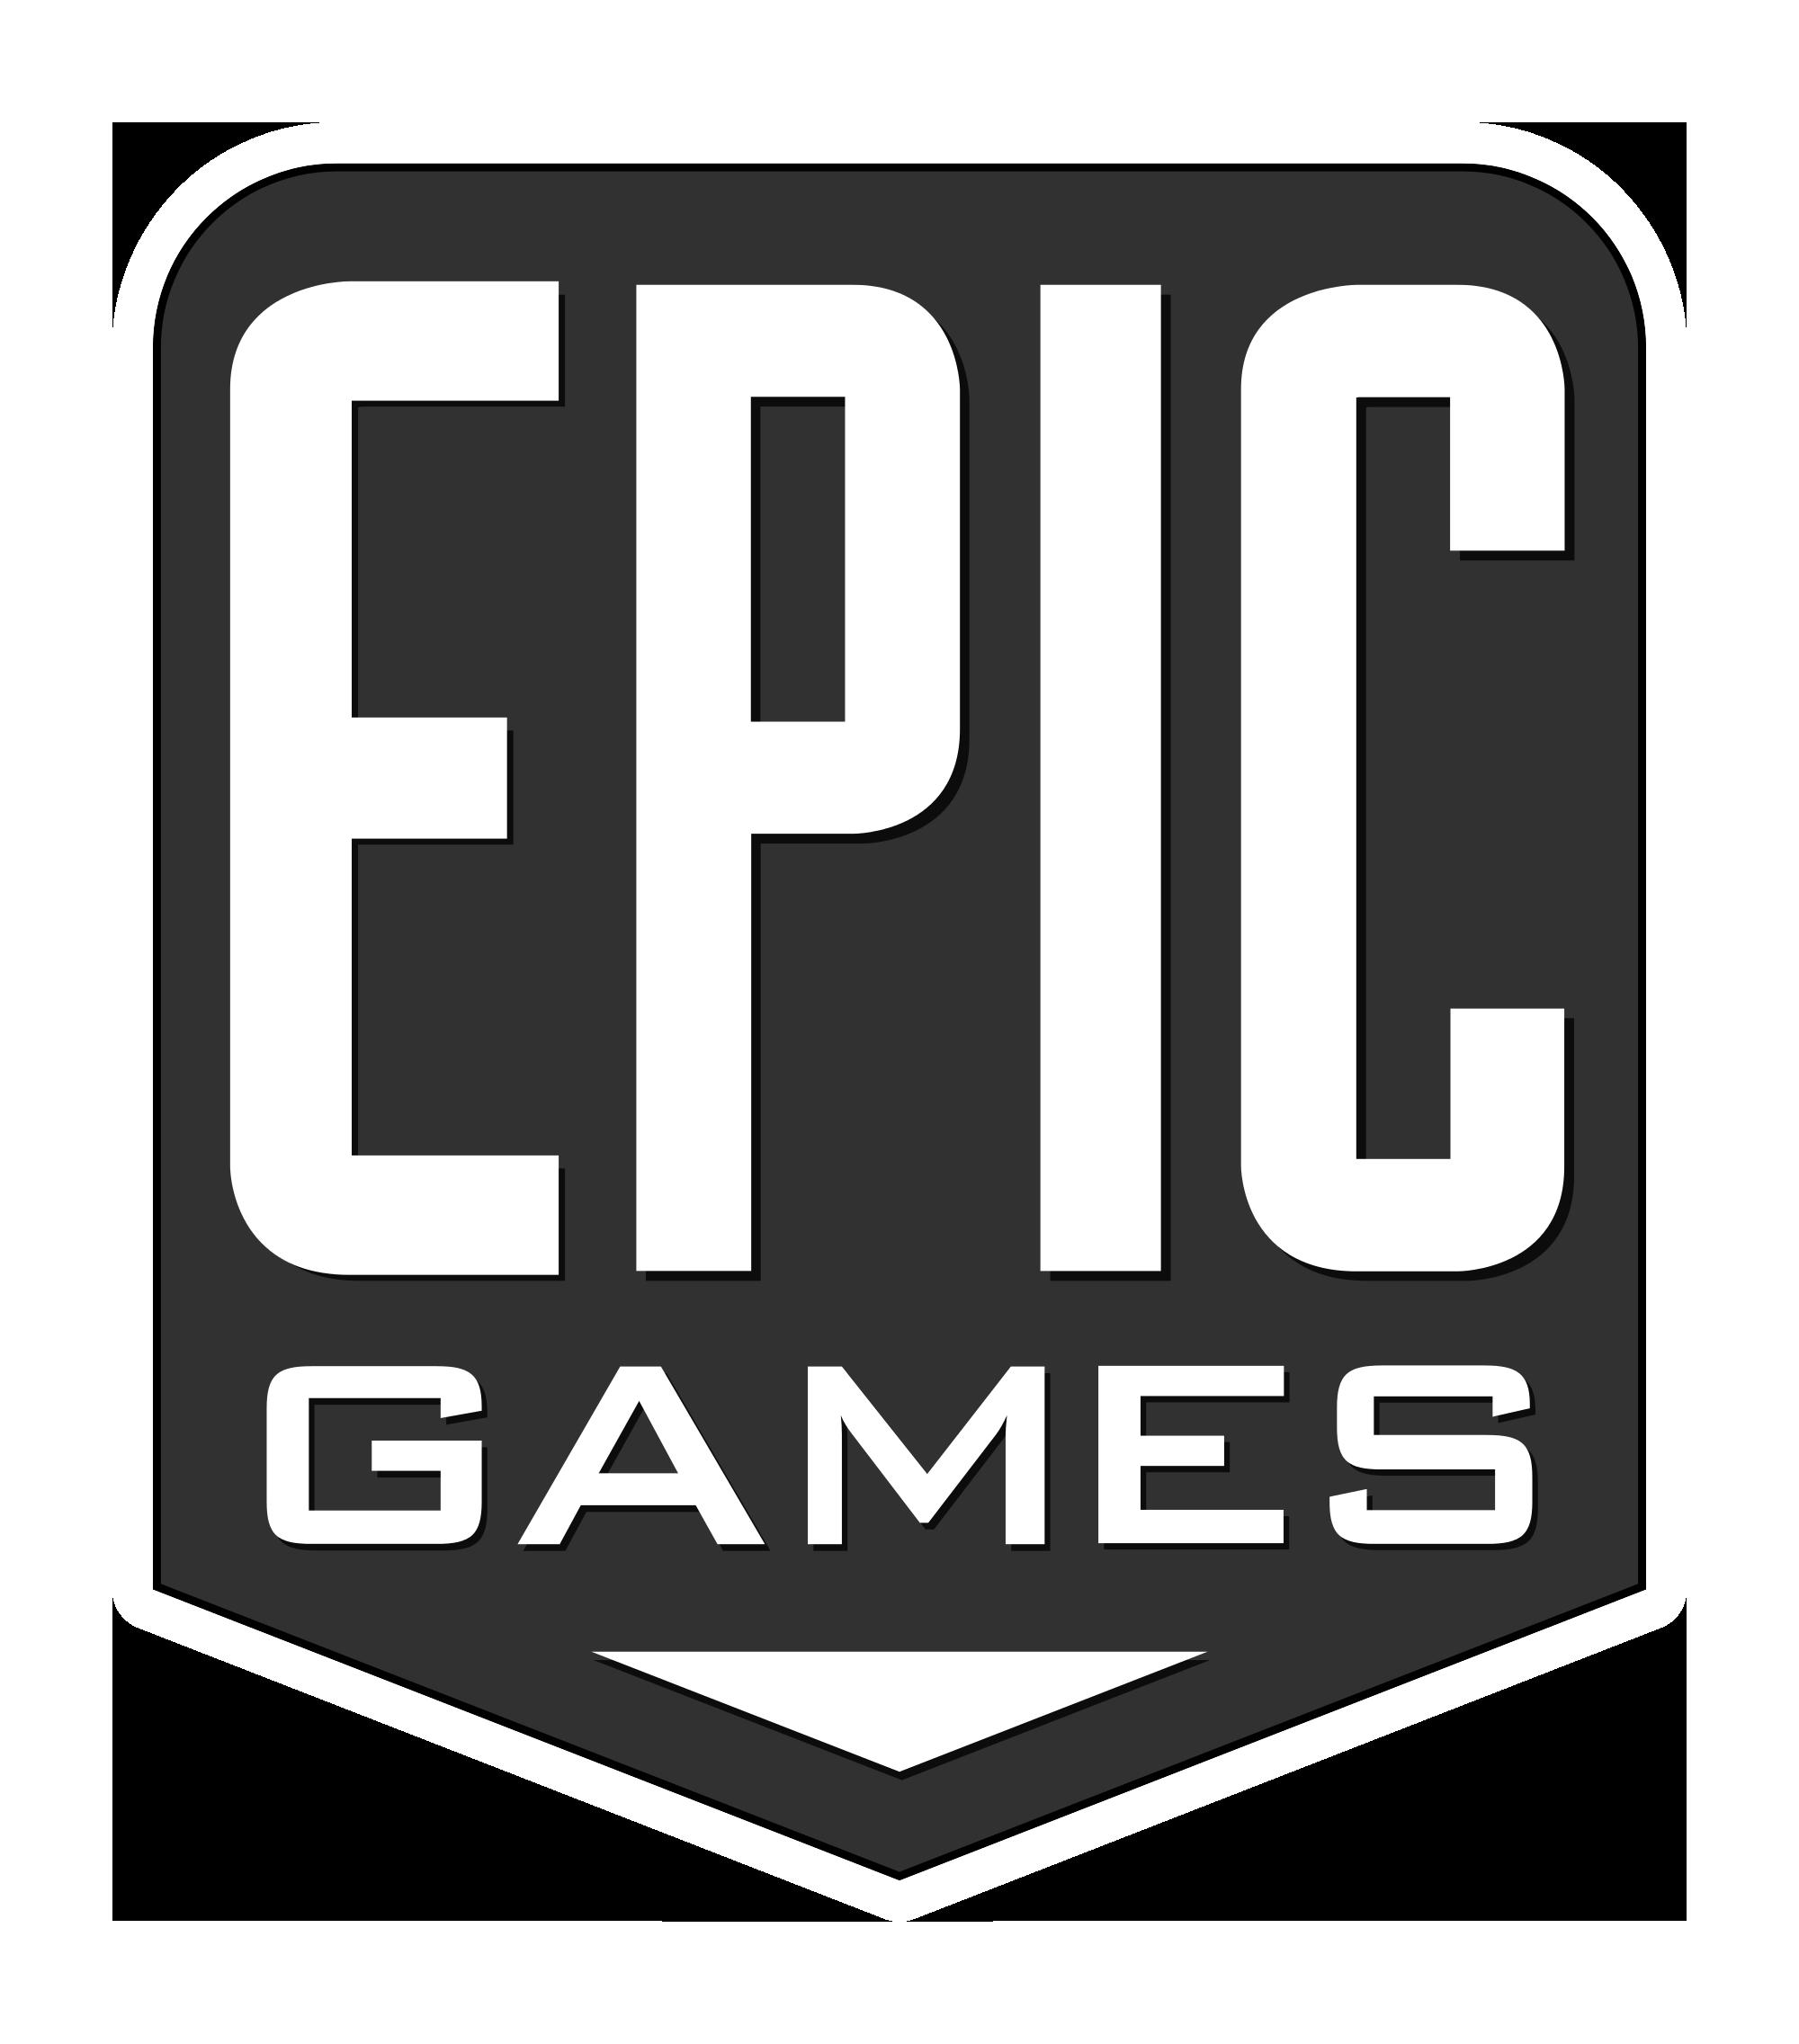 Epic社長「他機種の優位を隠す秘密の契約など無い。取り組みの成果を完全に公開した」